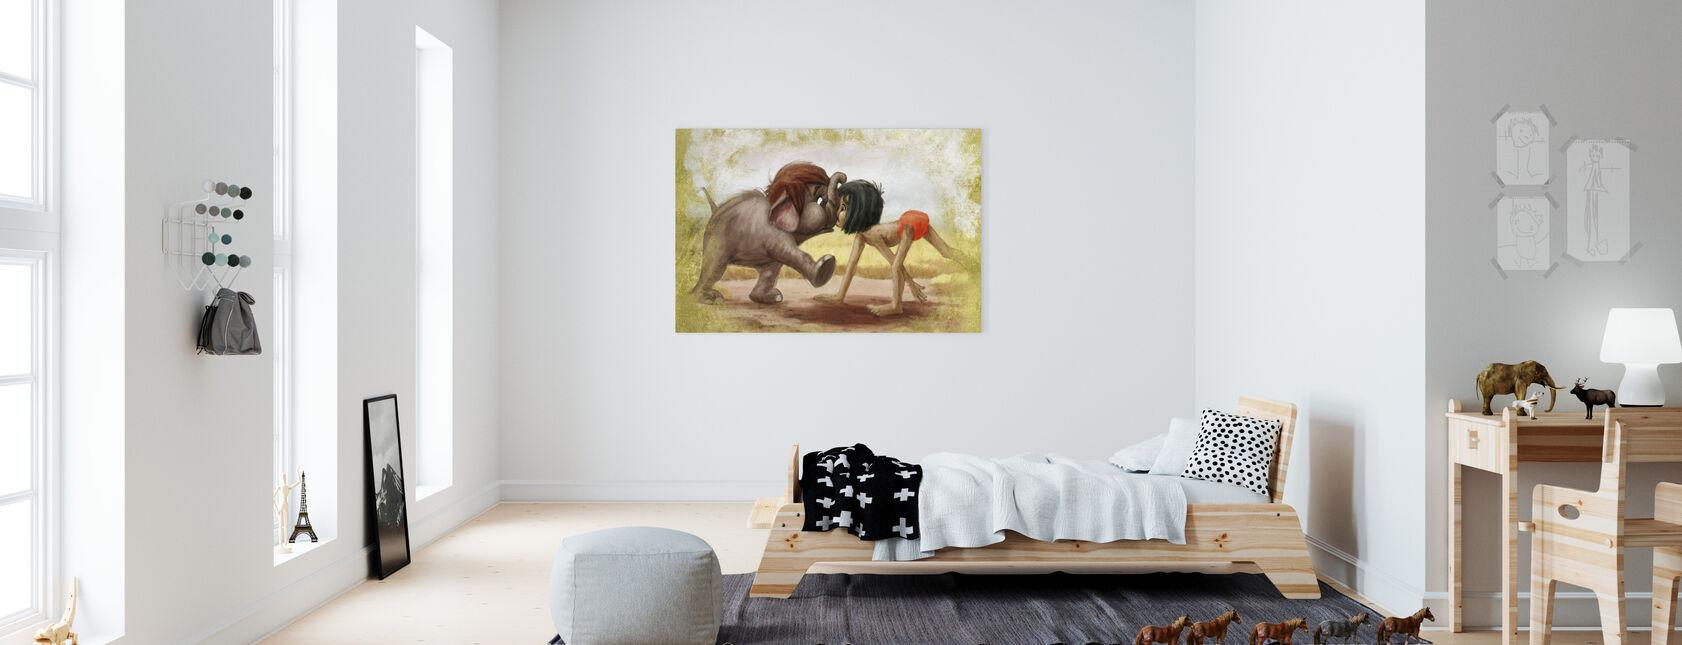 Disney Classics - Djungelbok - Canvastavla - Barnrum